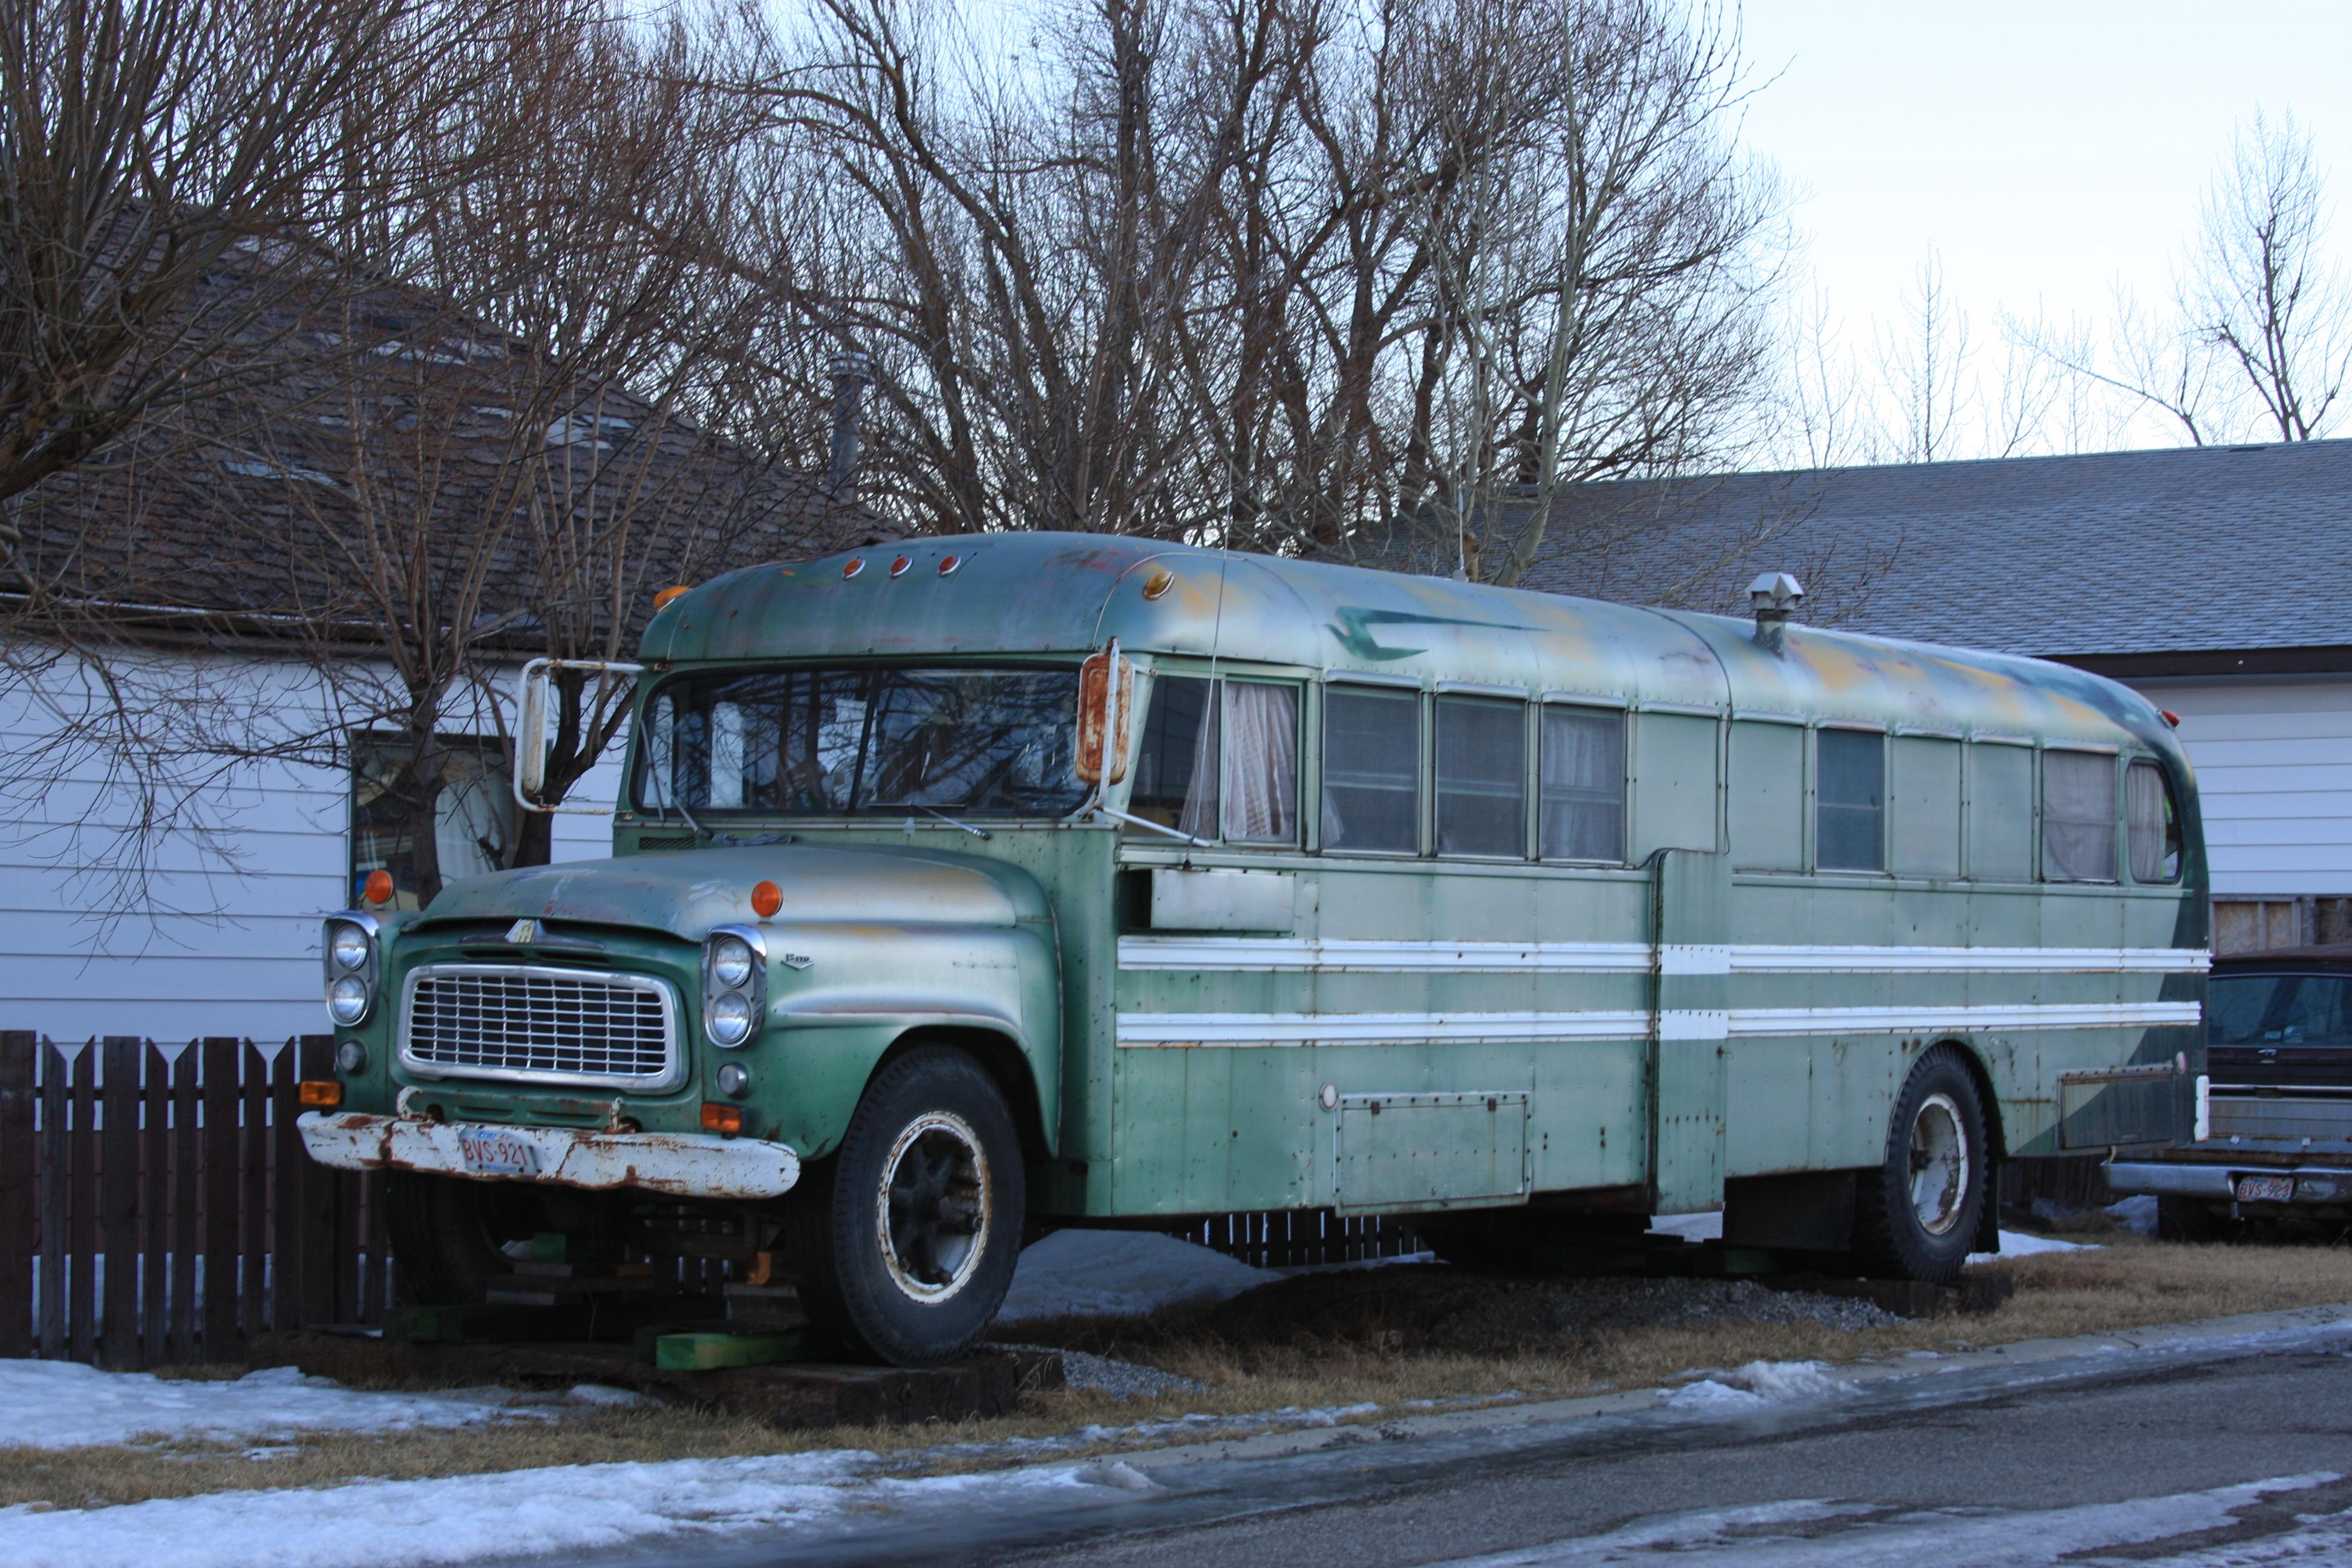 Bus_-_International_%283208709464%29.jpg